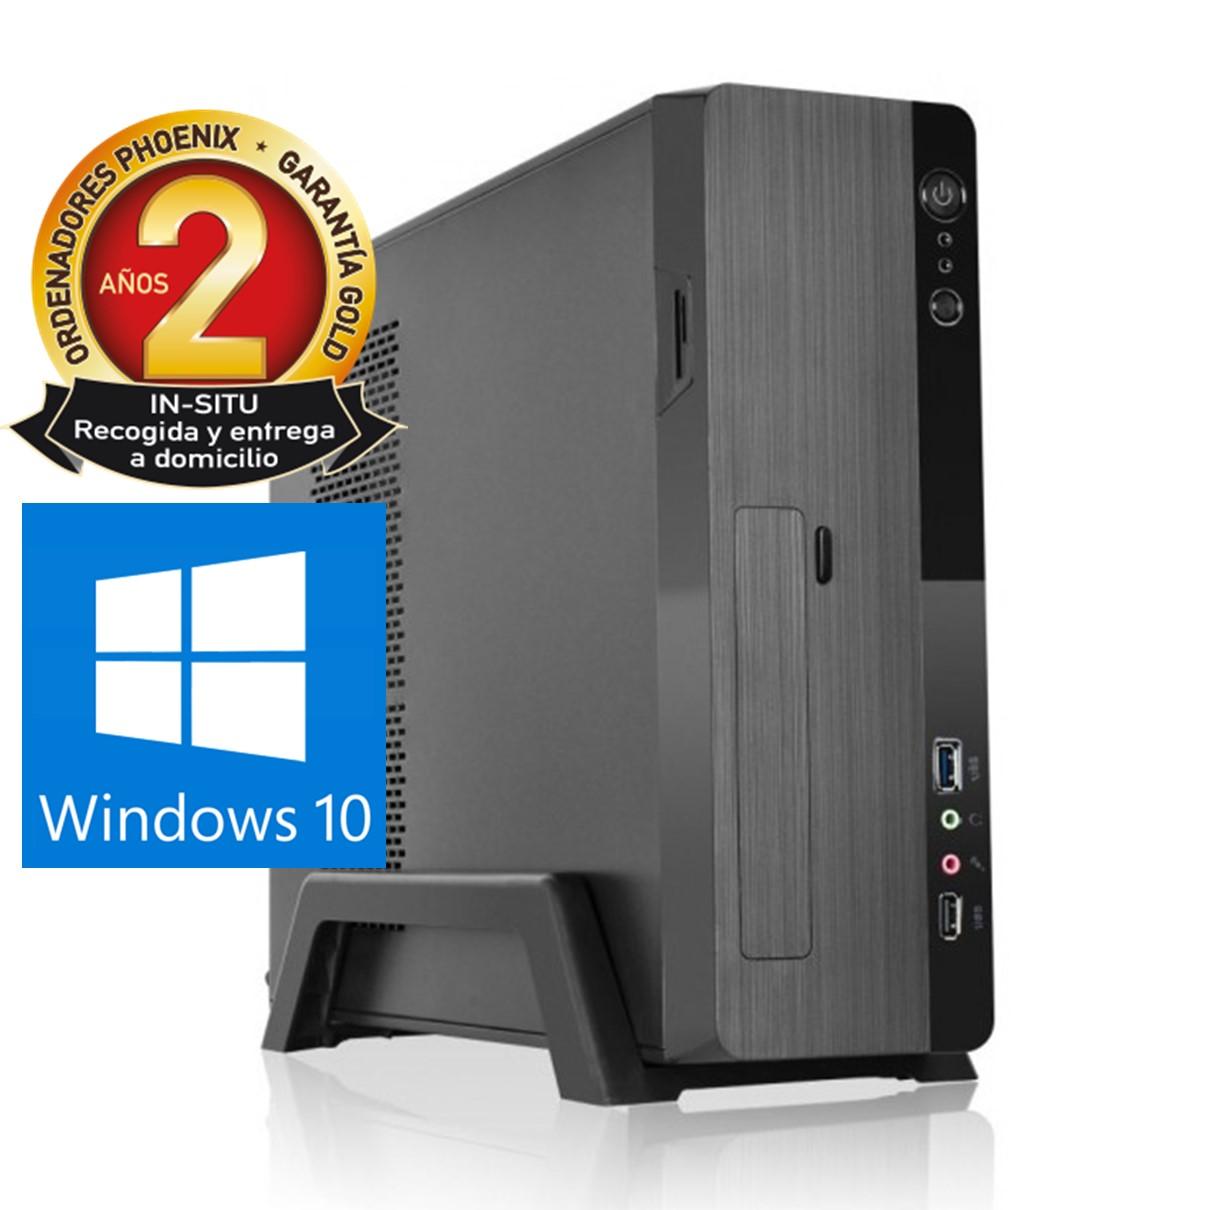 ORDENADOR DE OFICINA PHOENIX ZITY AMD RYZEN 3 3200G 8GB DDR4 480 GB SSD MICRO ATX SLIM  PC SOBREMESA WINDOWS 10 HOME